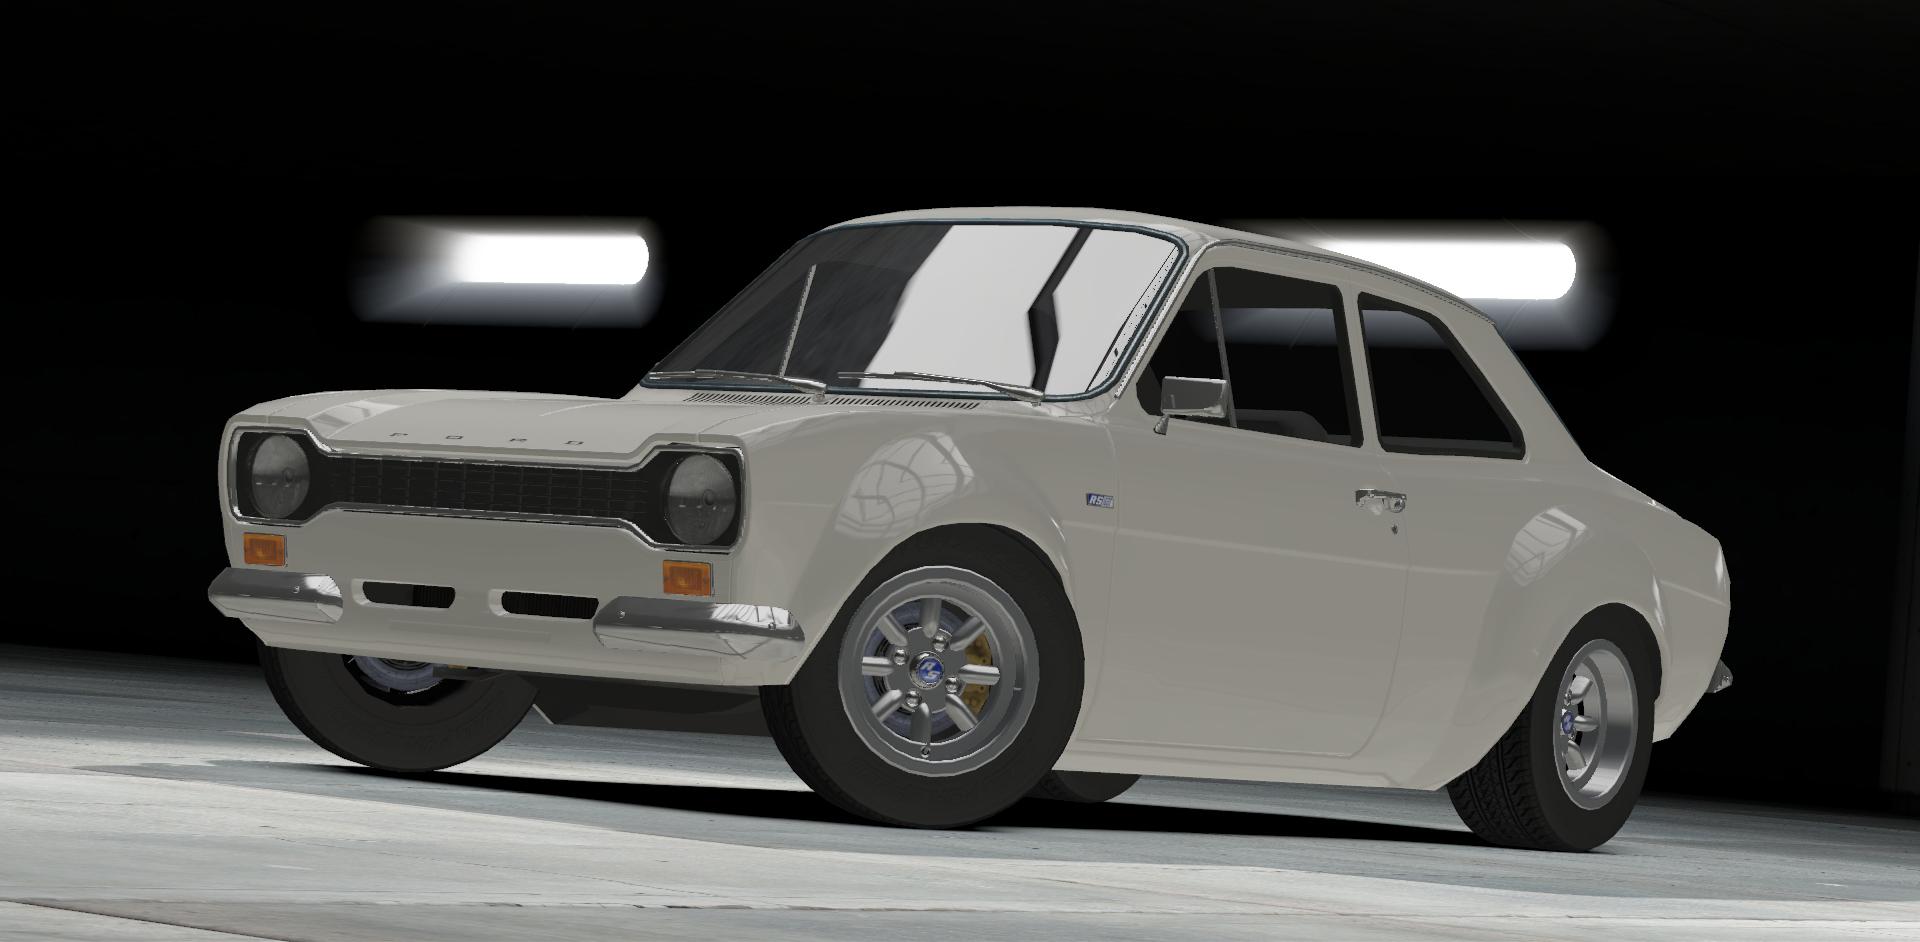 Ford Escort Mk1 RS1600